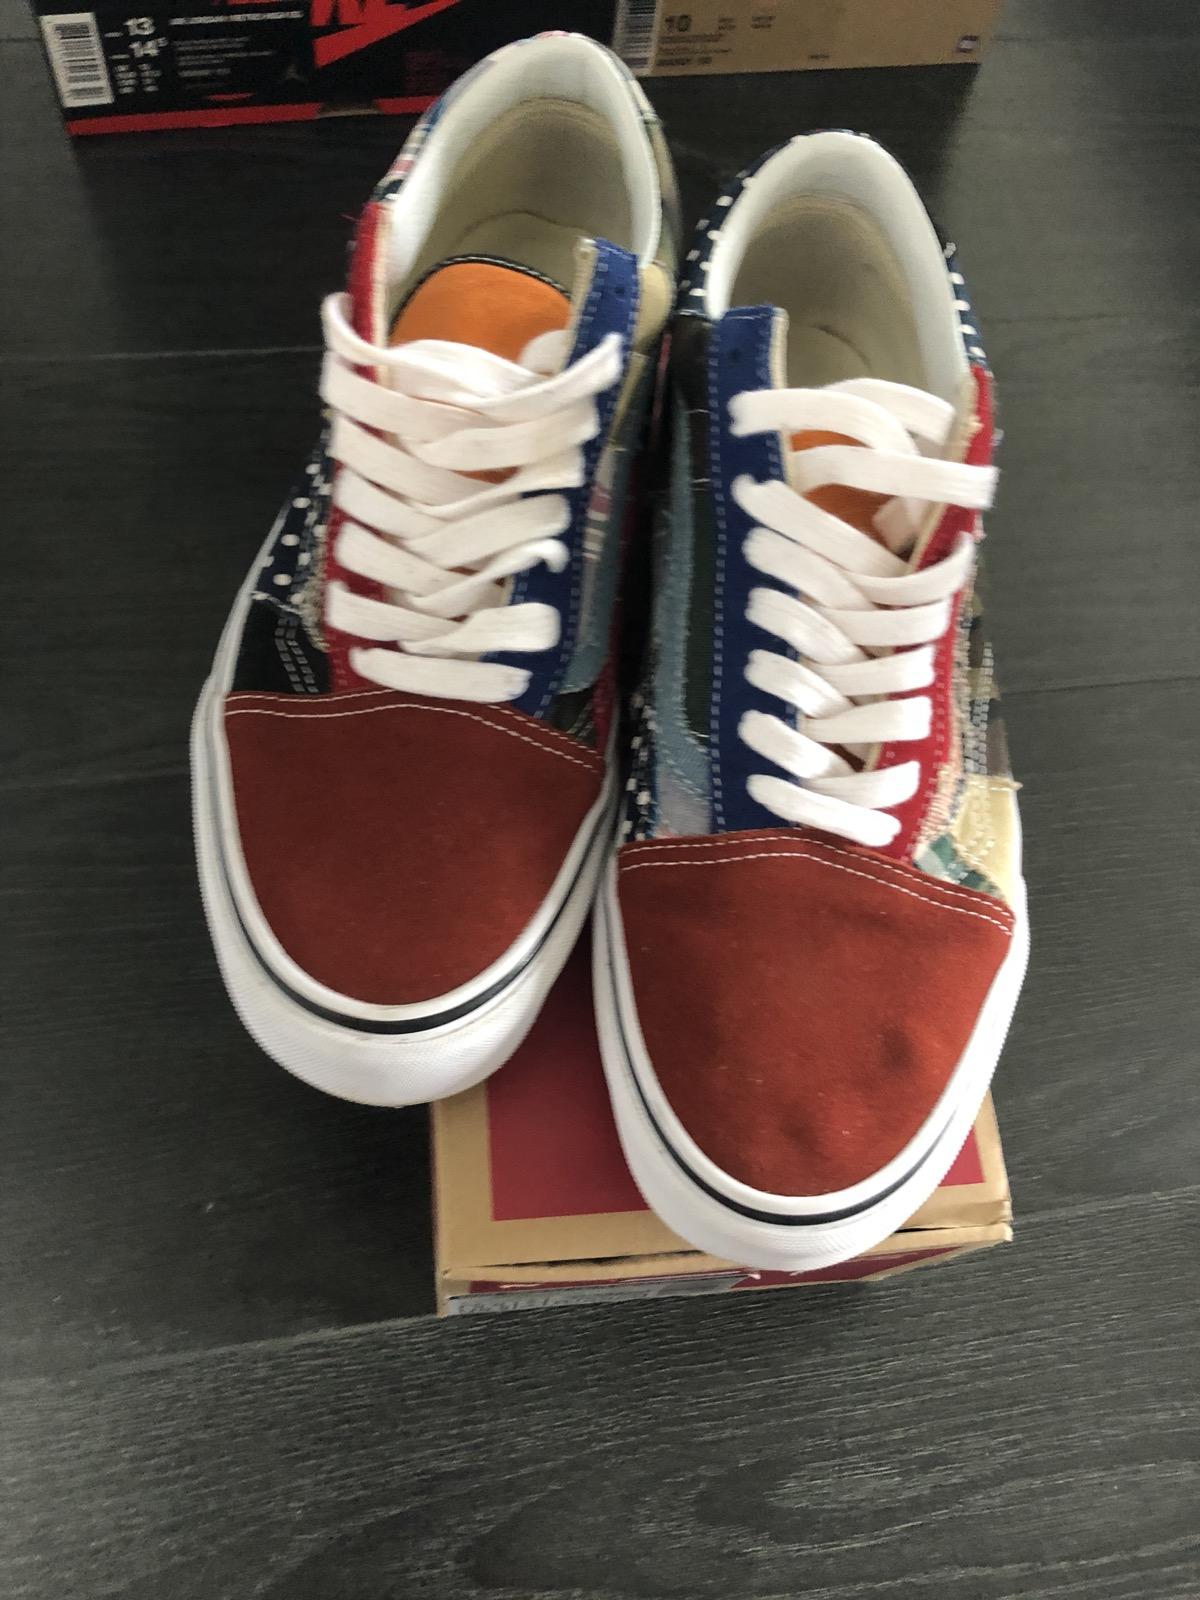 6efc126306572b Vans Vans Old Skool Patchwork Factory Floor Size 9 - Low-Top Sneakers for  Sale - Grailed